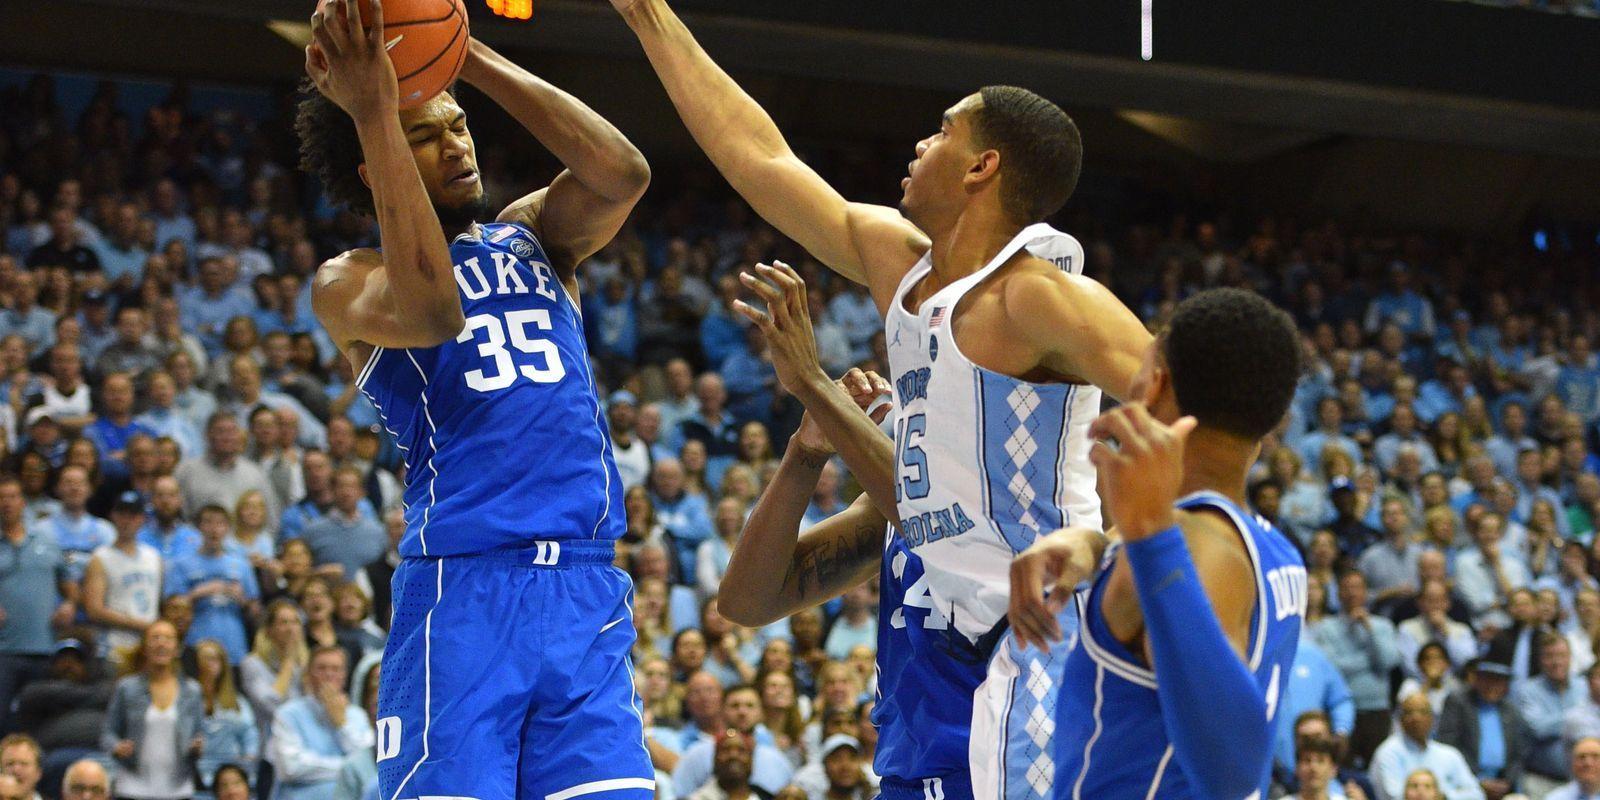 DukeNorth Carolina highlights top college basketball